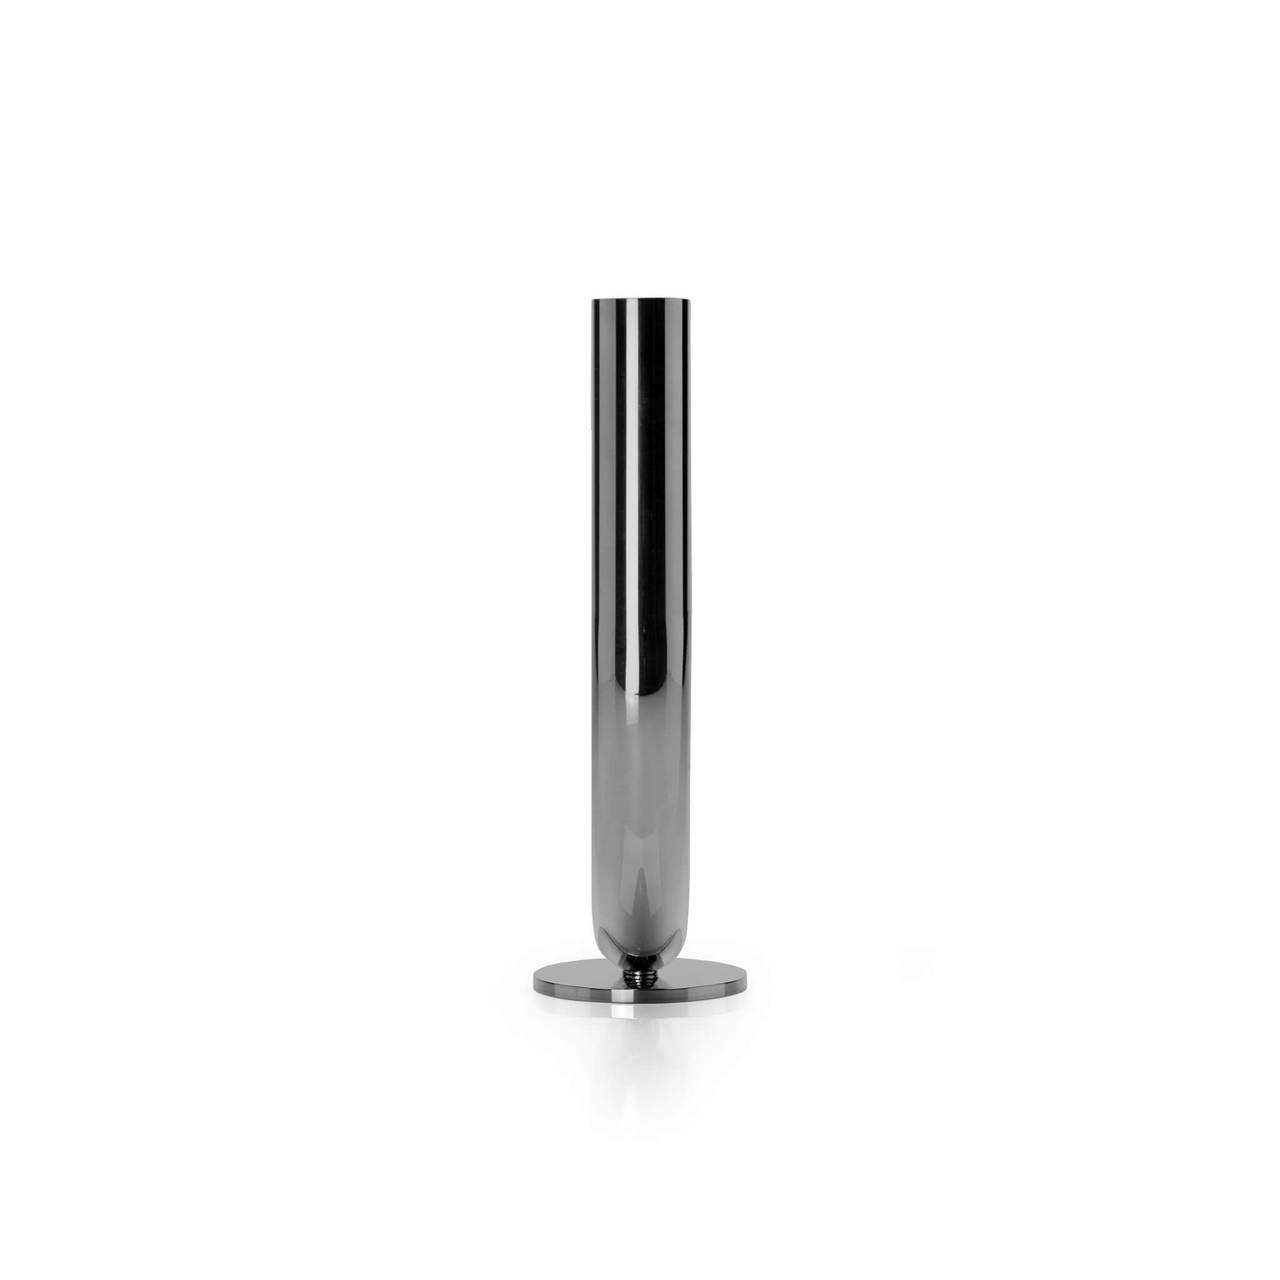 U Candleholder in Black Nickel finish side profile